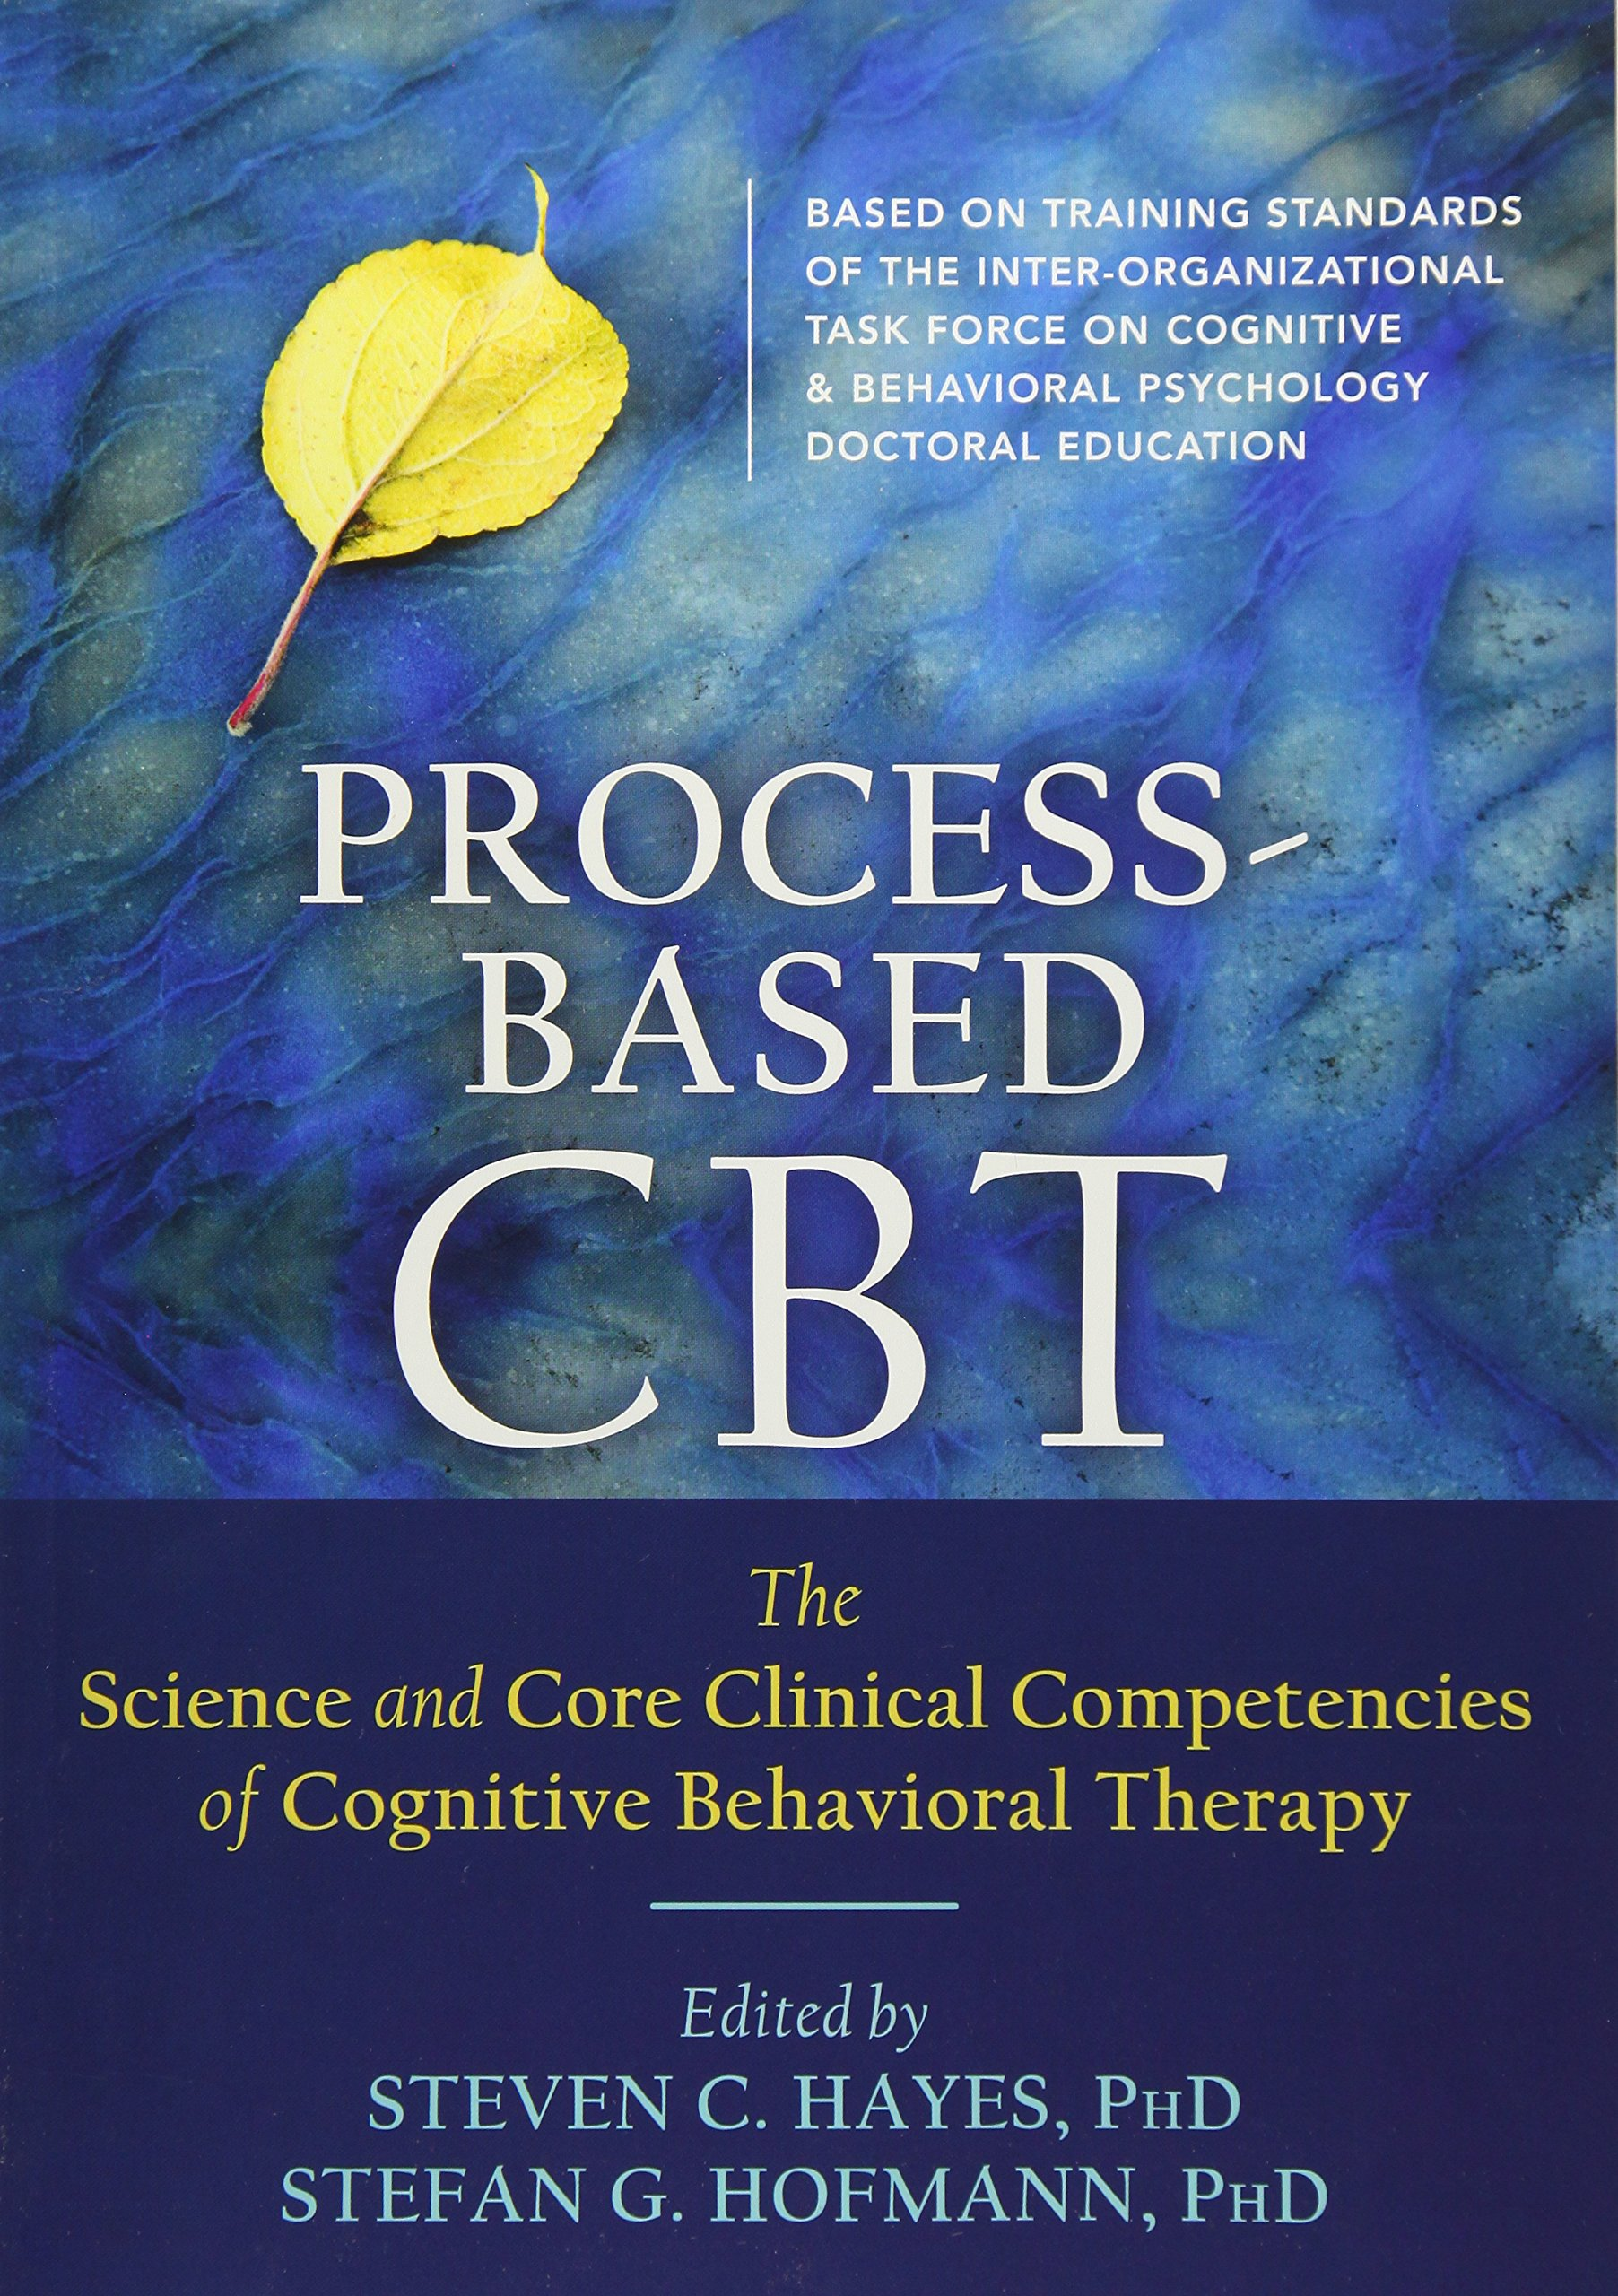 processbasedCBT cover